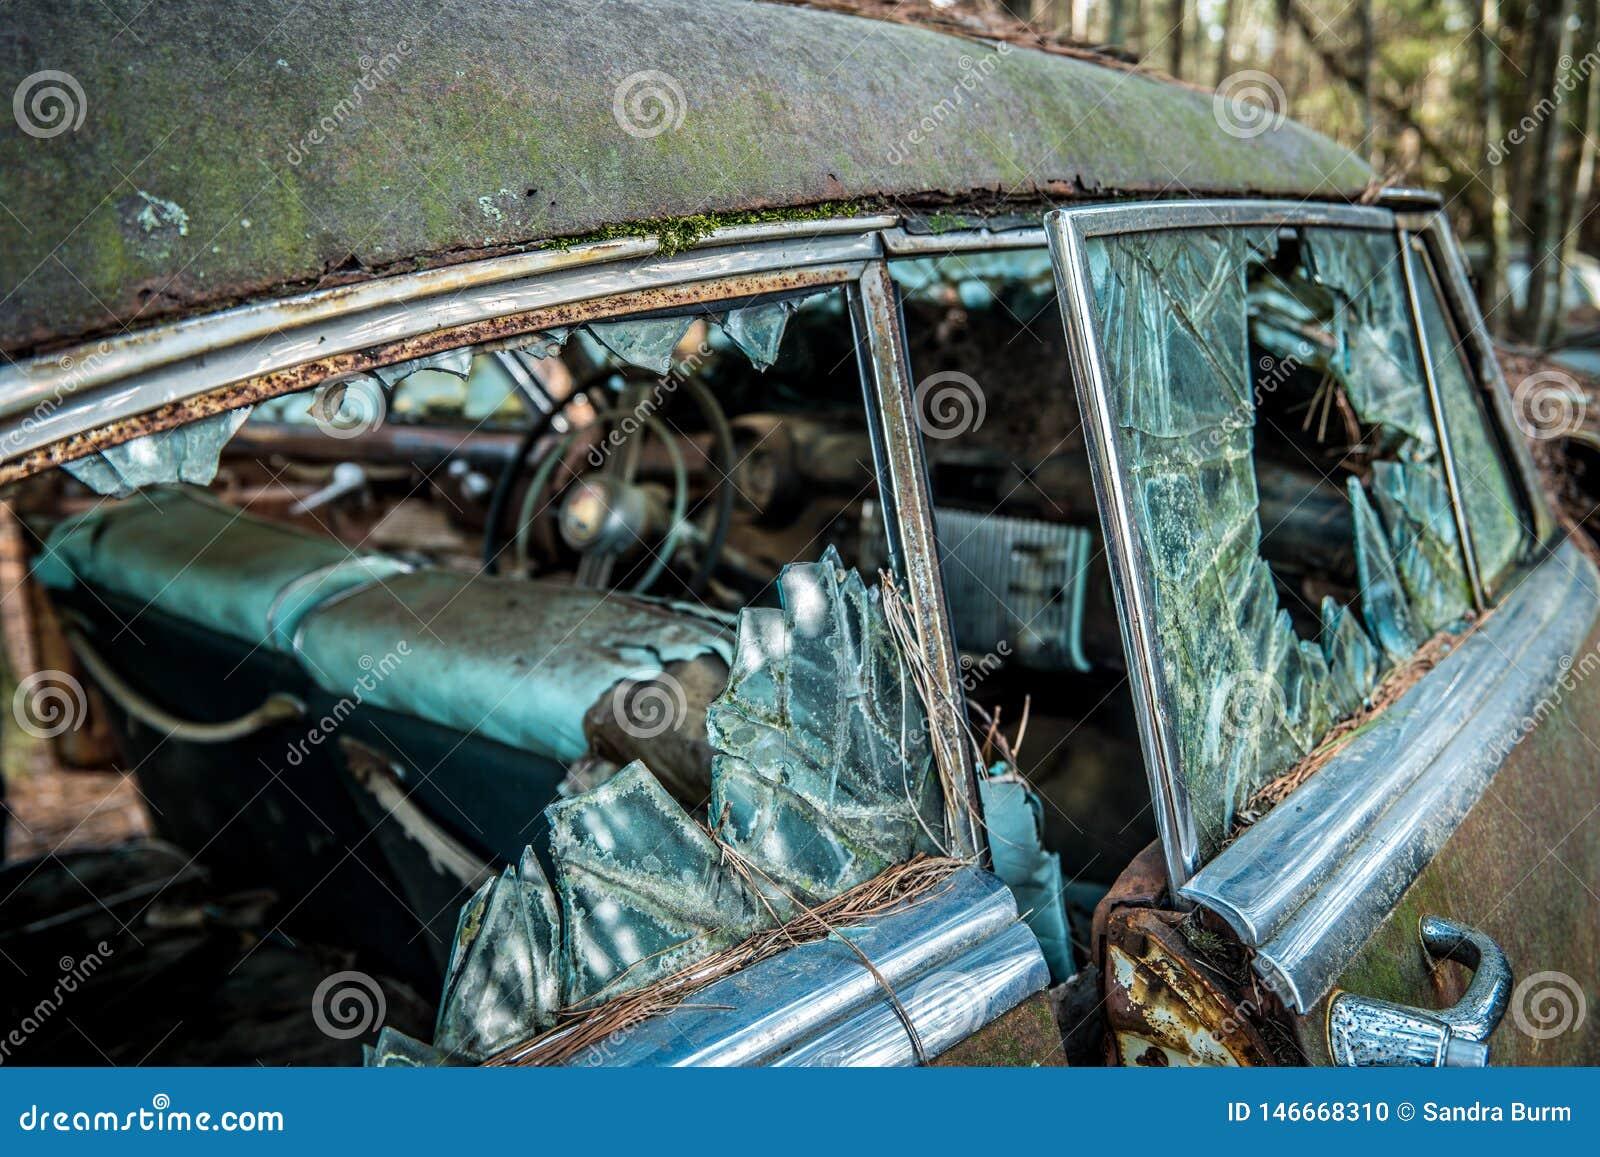 White, Georgia USA 3/28/2018 Decaying car